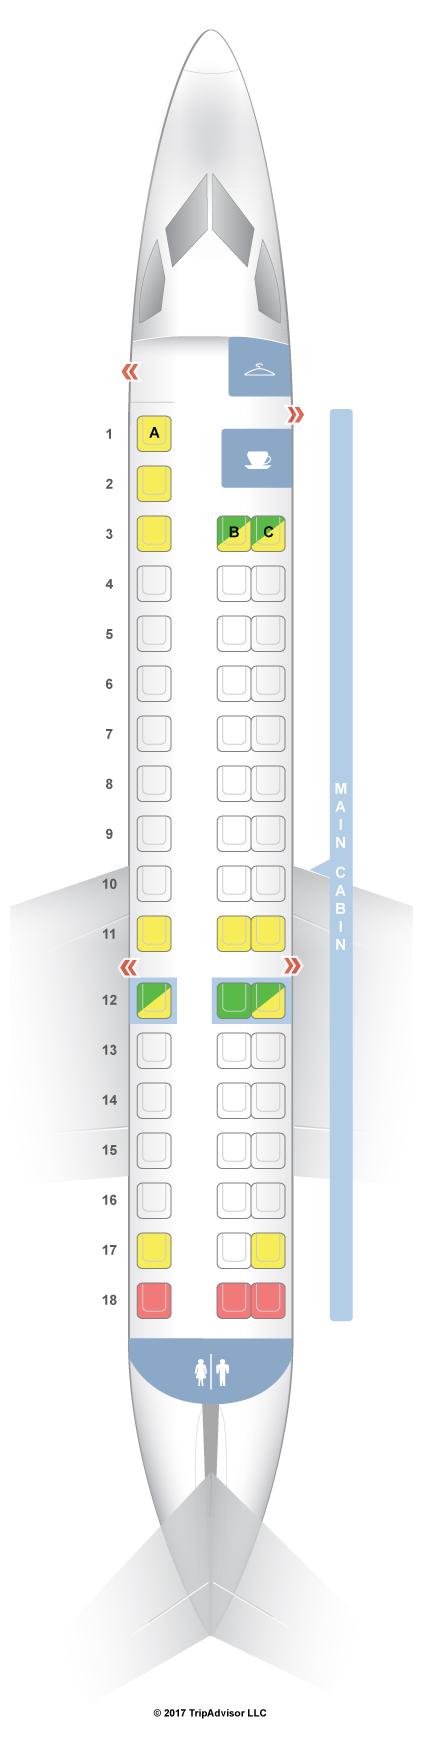 SeatGuru Seat Map American Airlines Embraer ERJ ER - Us airways seating map